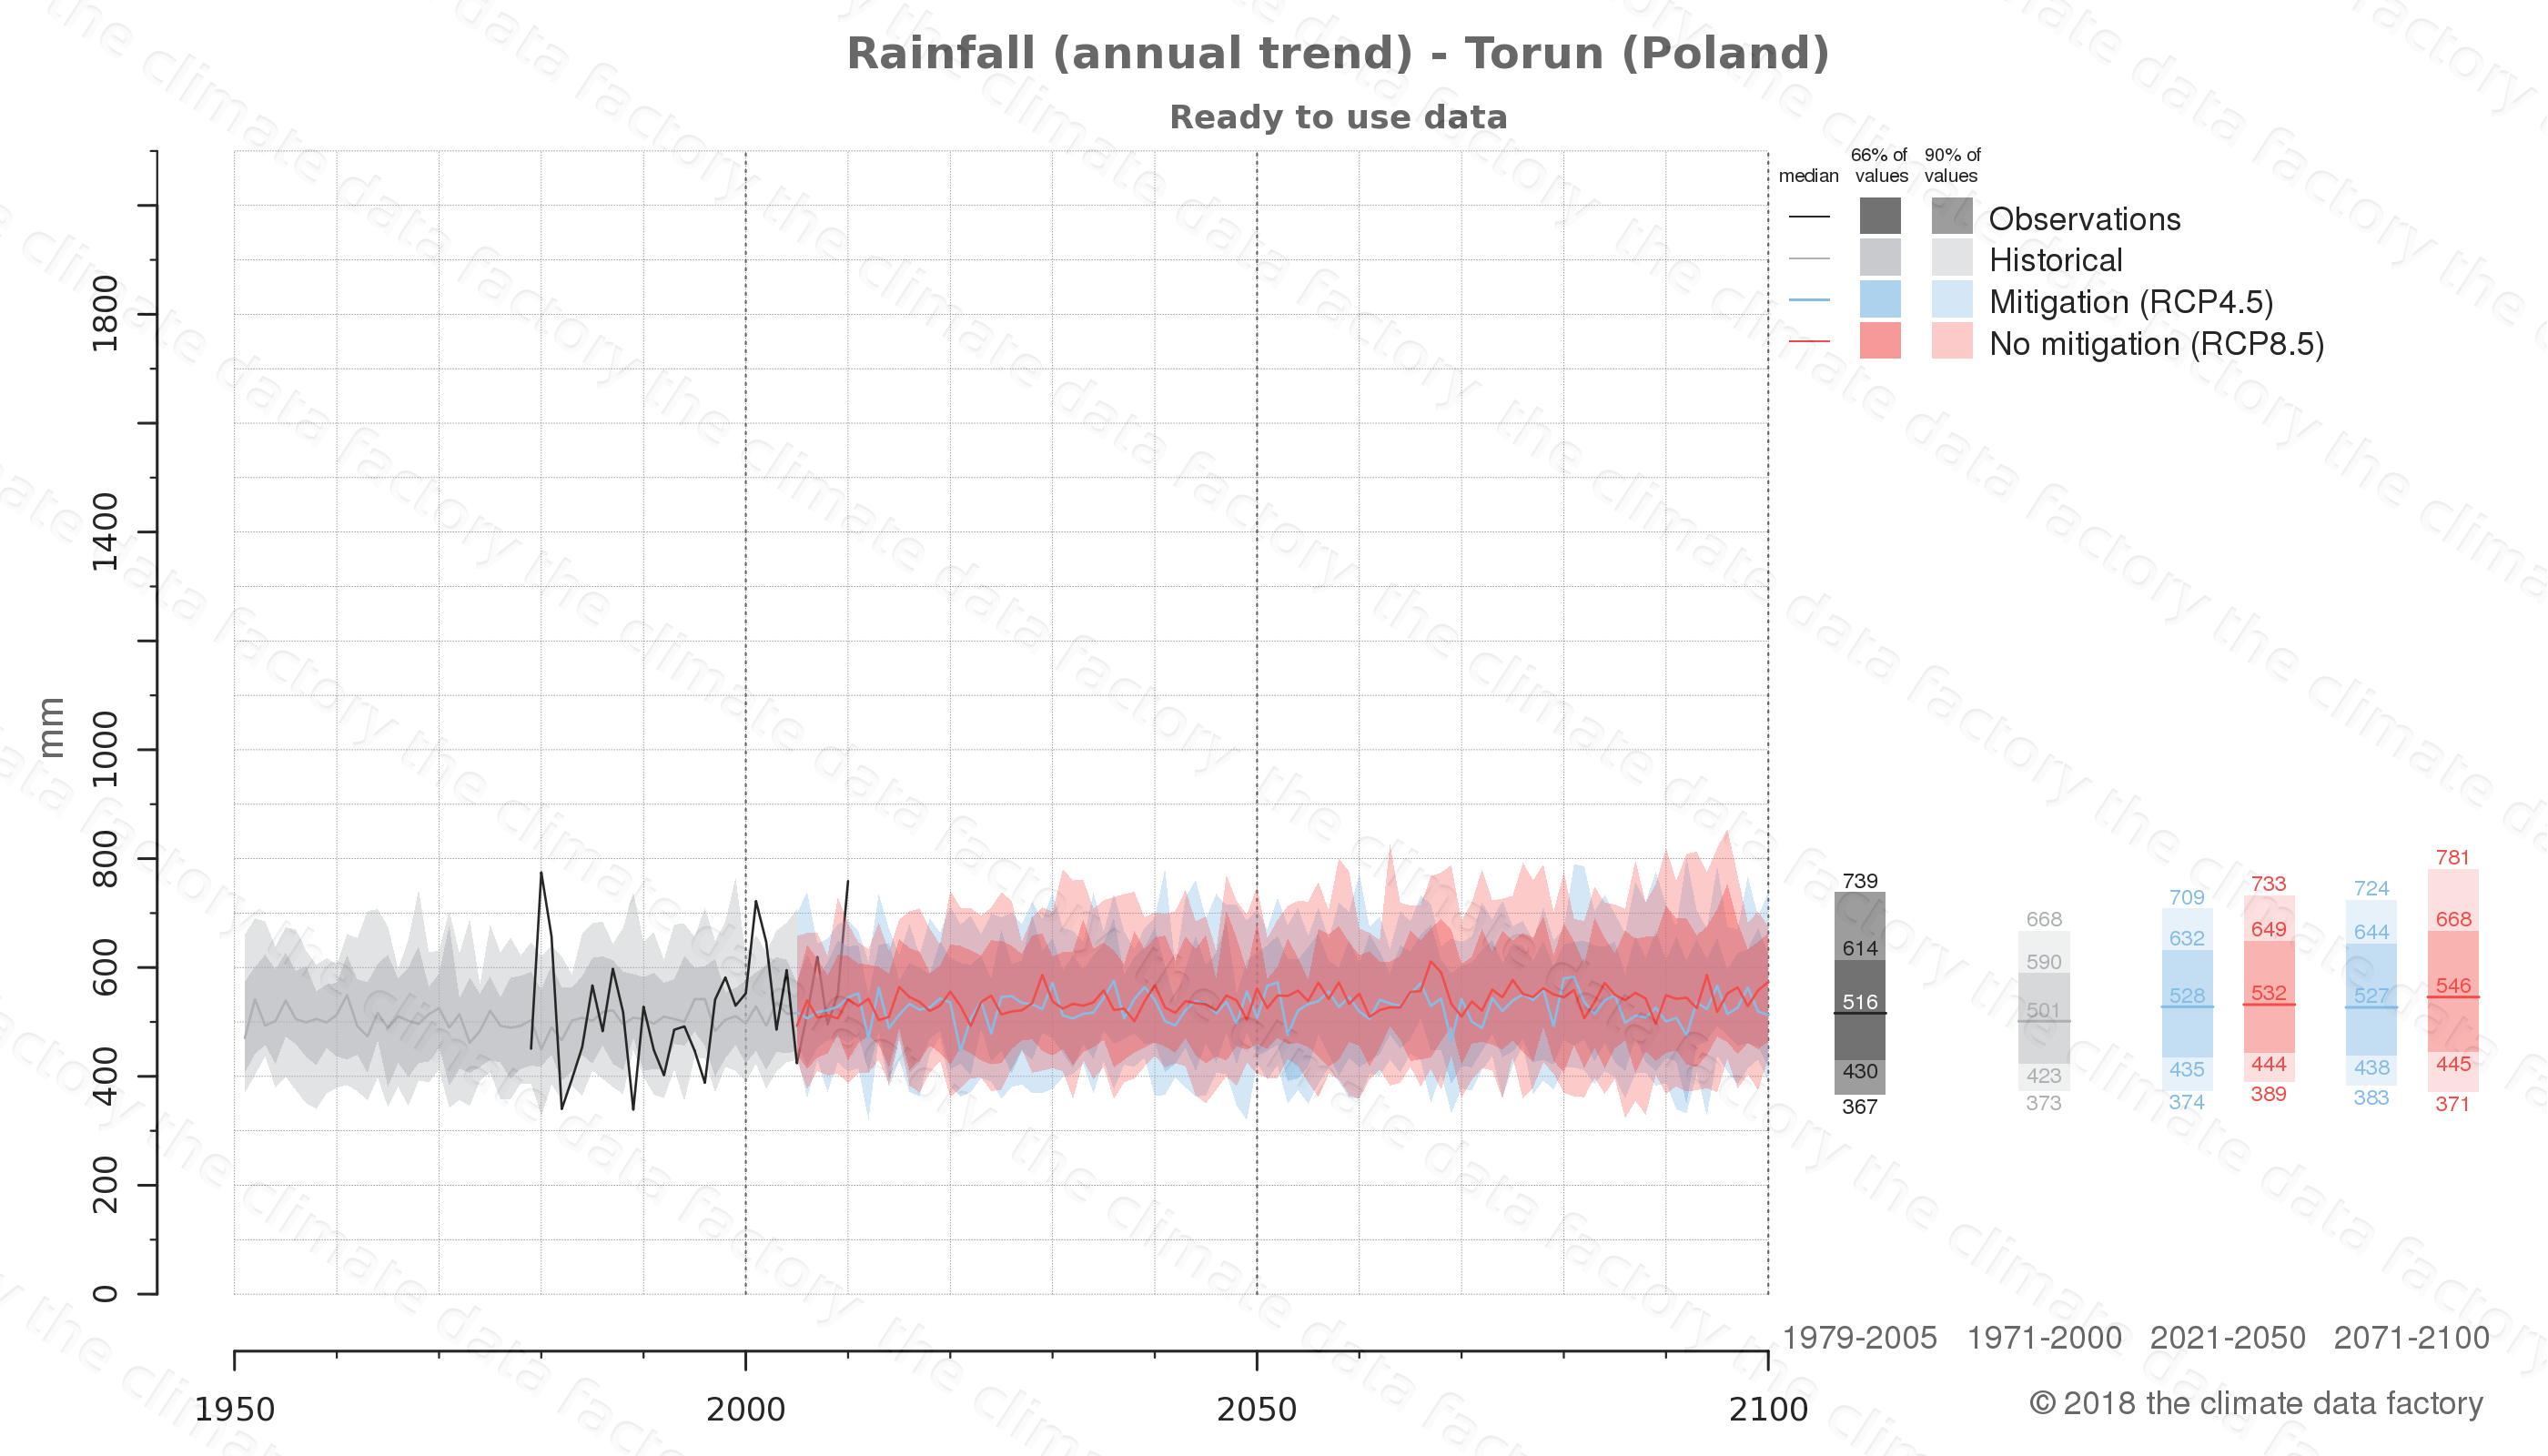 climate change data policy adaptation climate graph city data rainfall torun poland